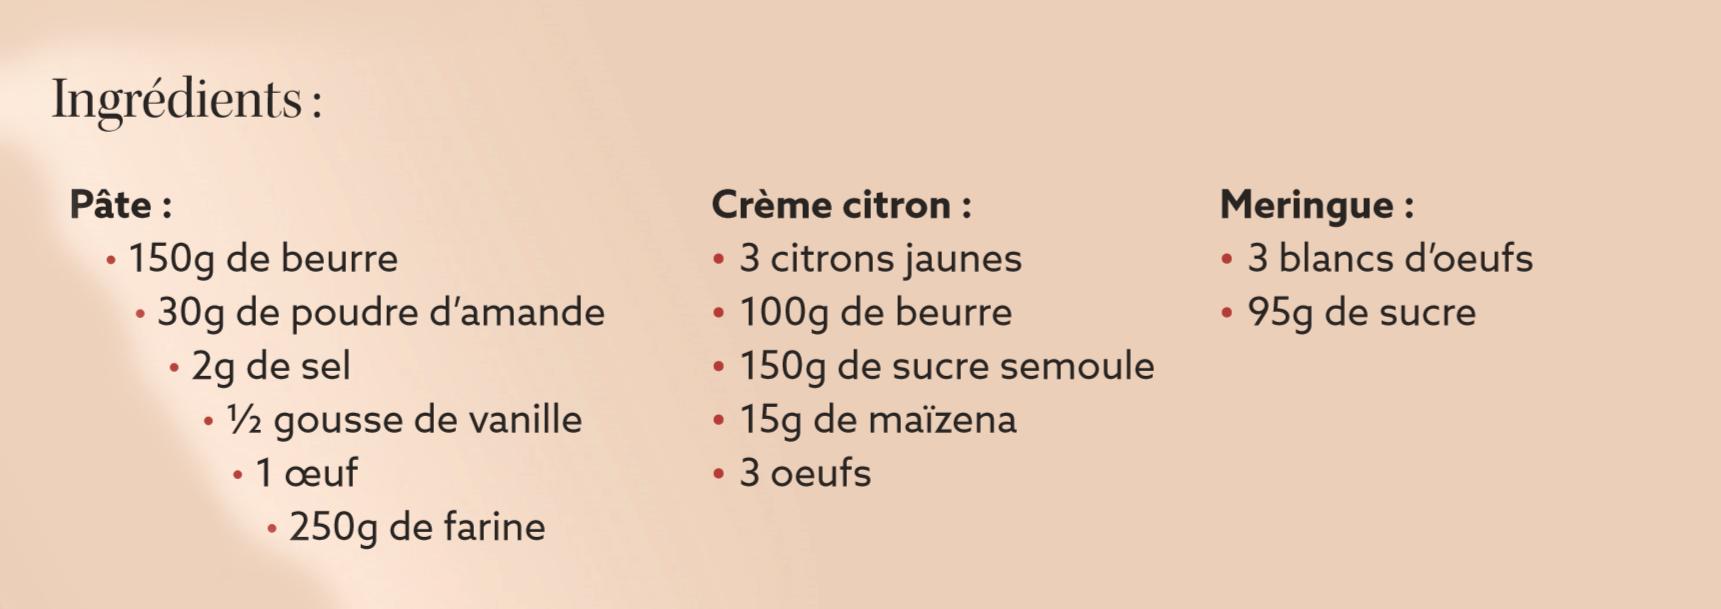 description tarte citron